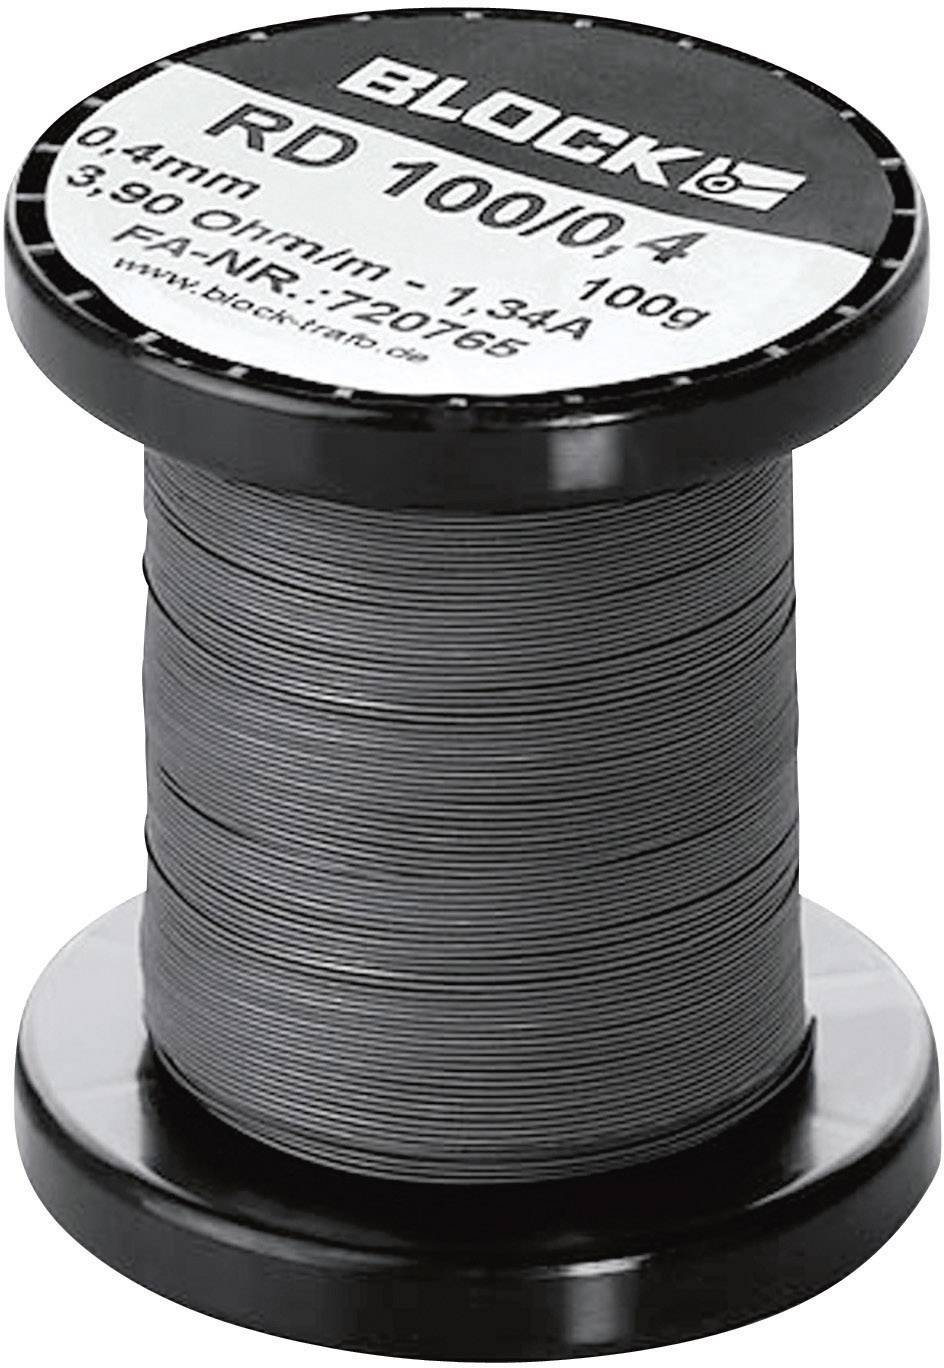 Odporový drát (konstantan) 0.069 Ω/m Block RD 100/3,0 1.5 m